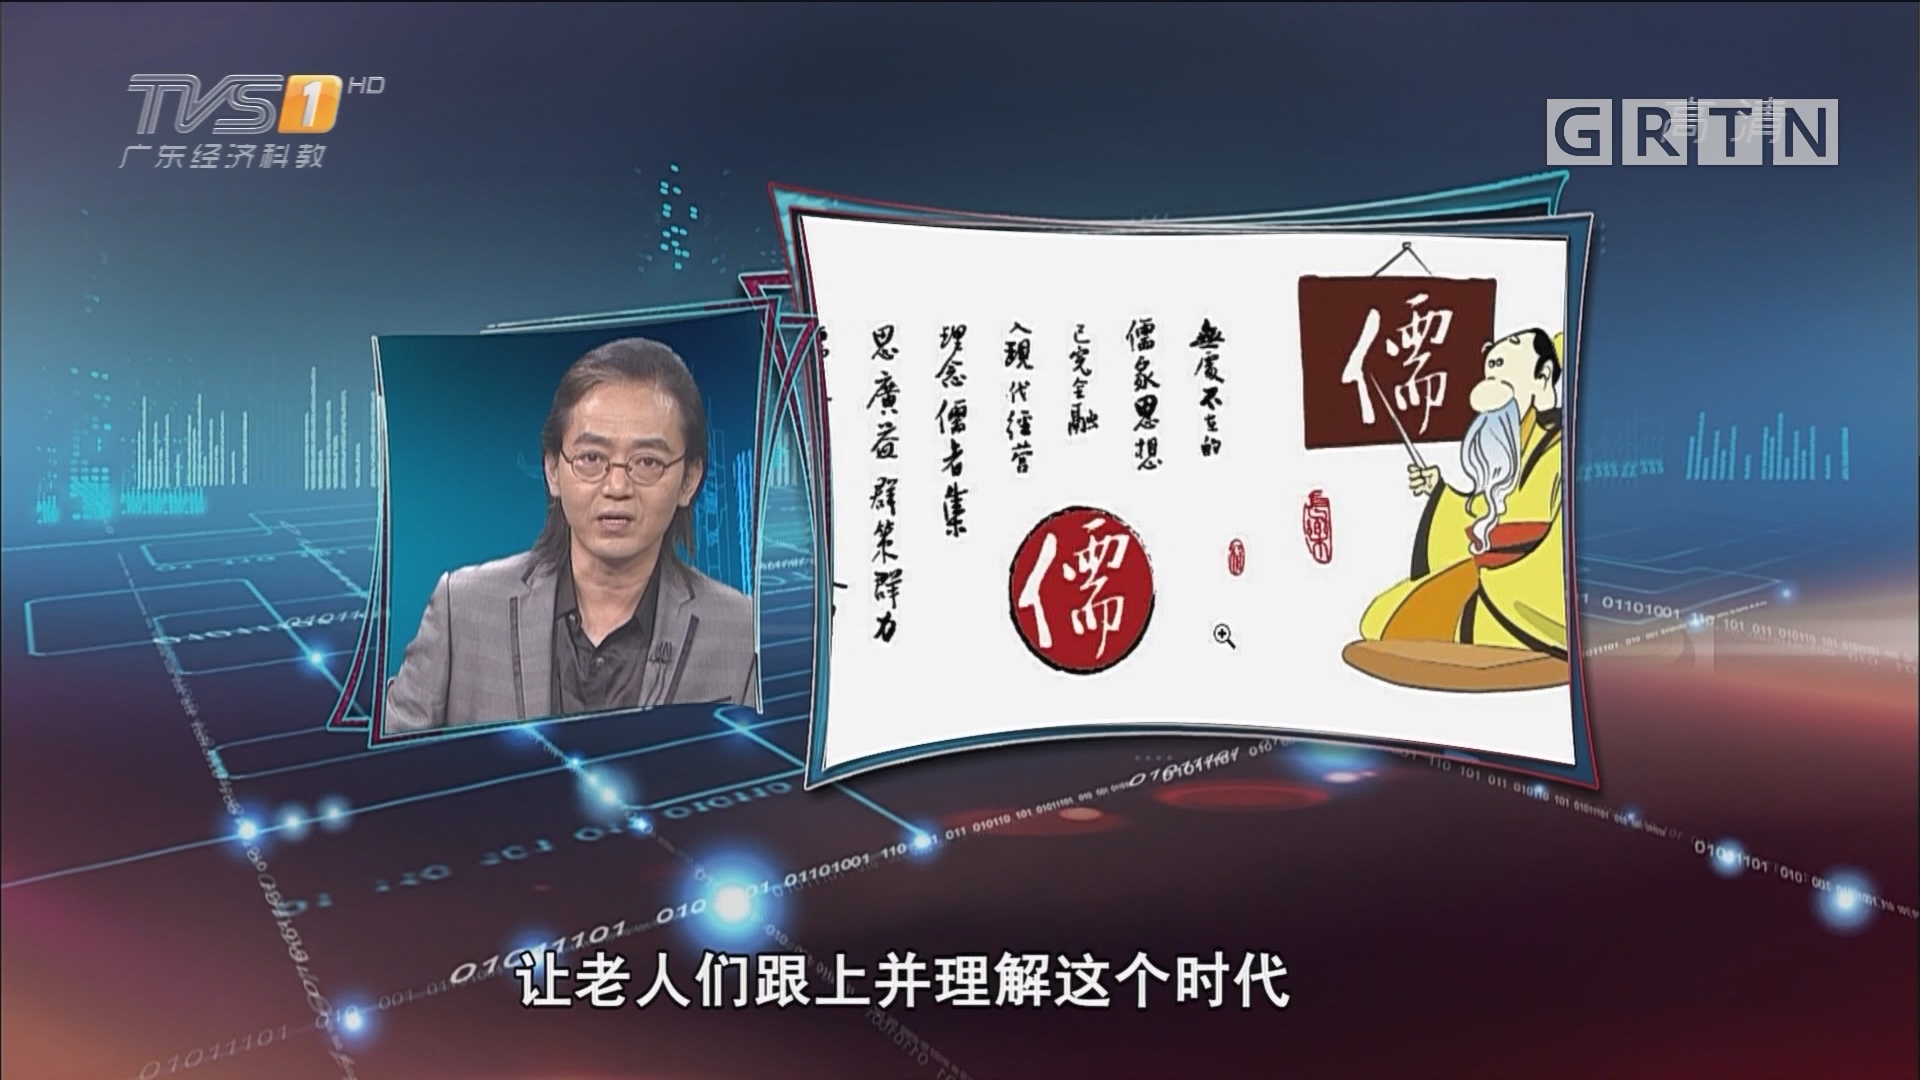 [HD][2017-07-18]马后炮:人人聊道德 事事谈道德 对社会未必是好事